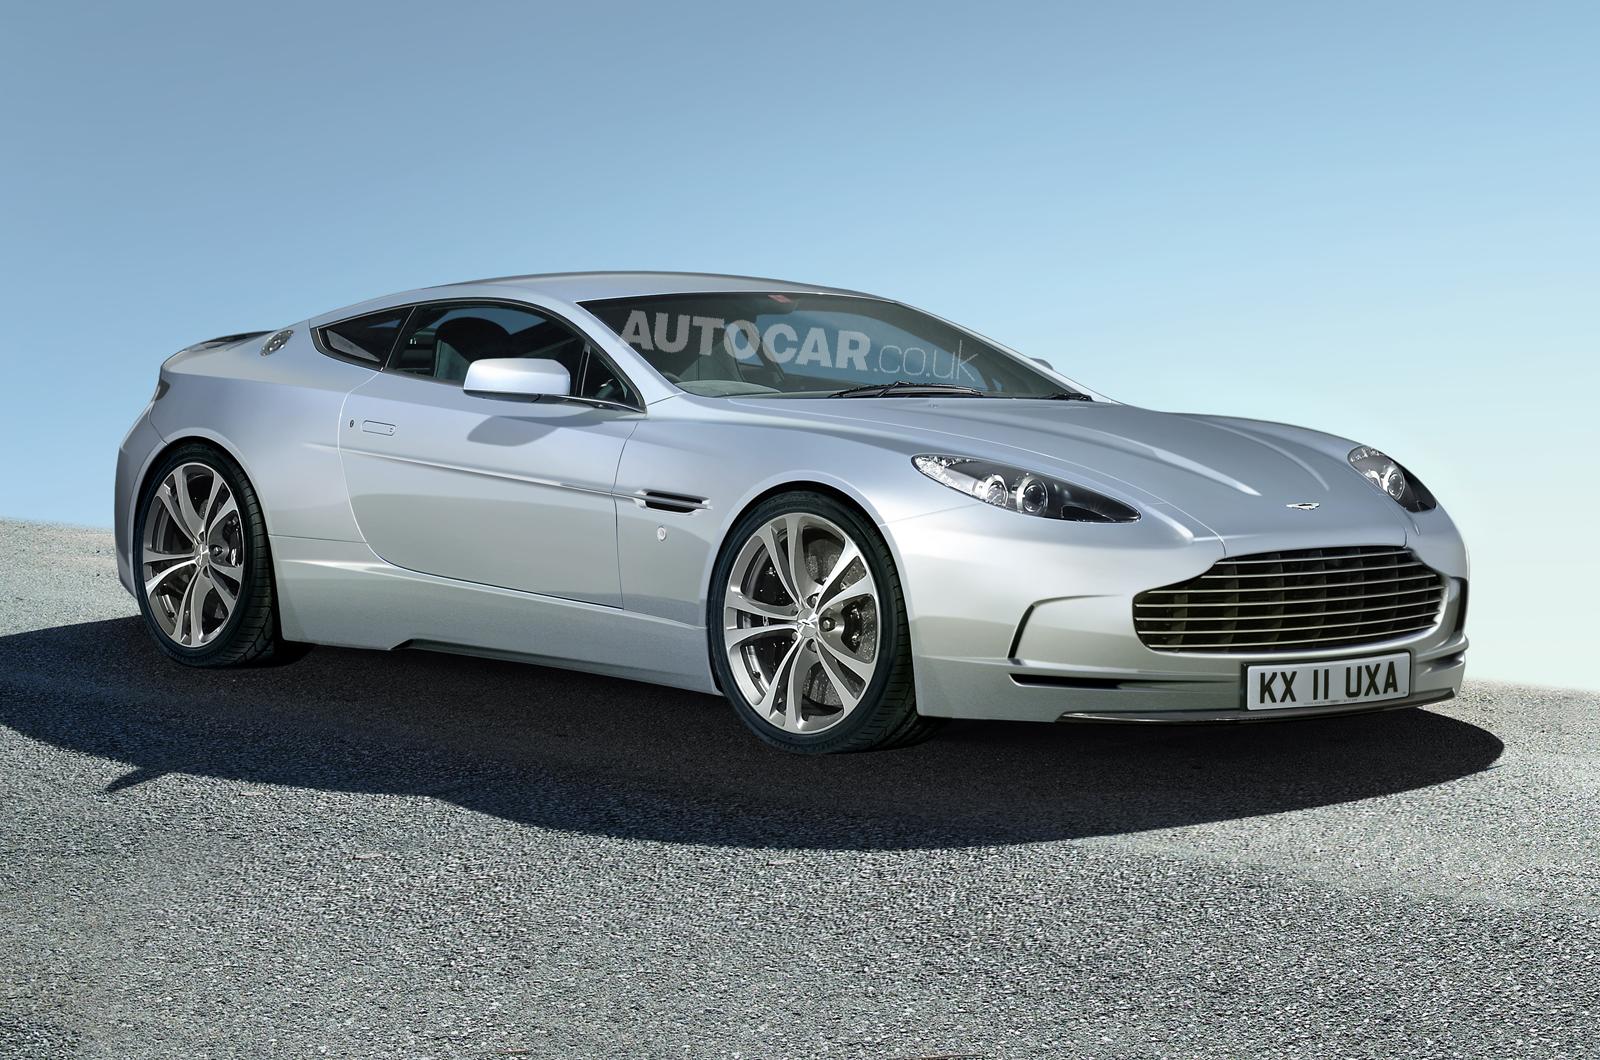 Next Generation Astons Safe Autocar